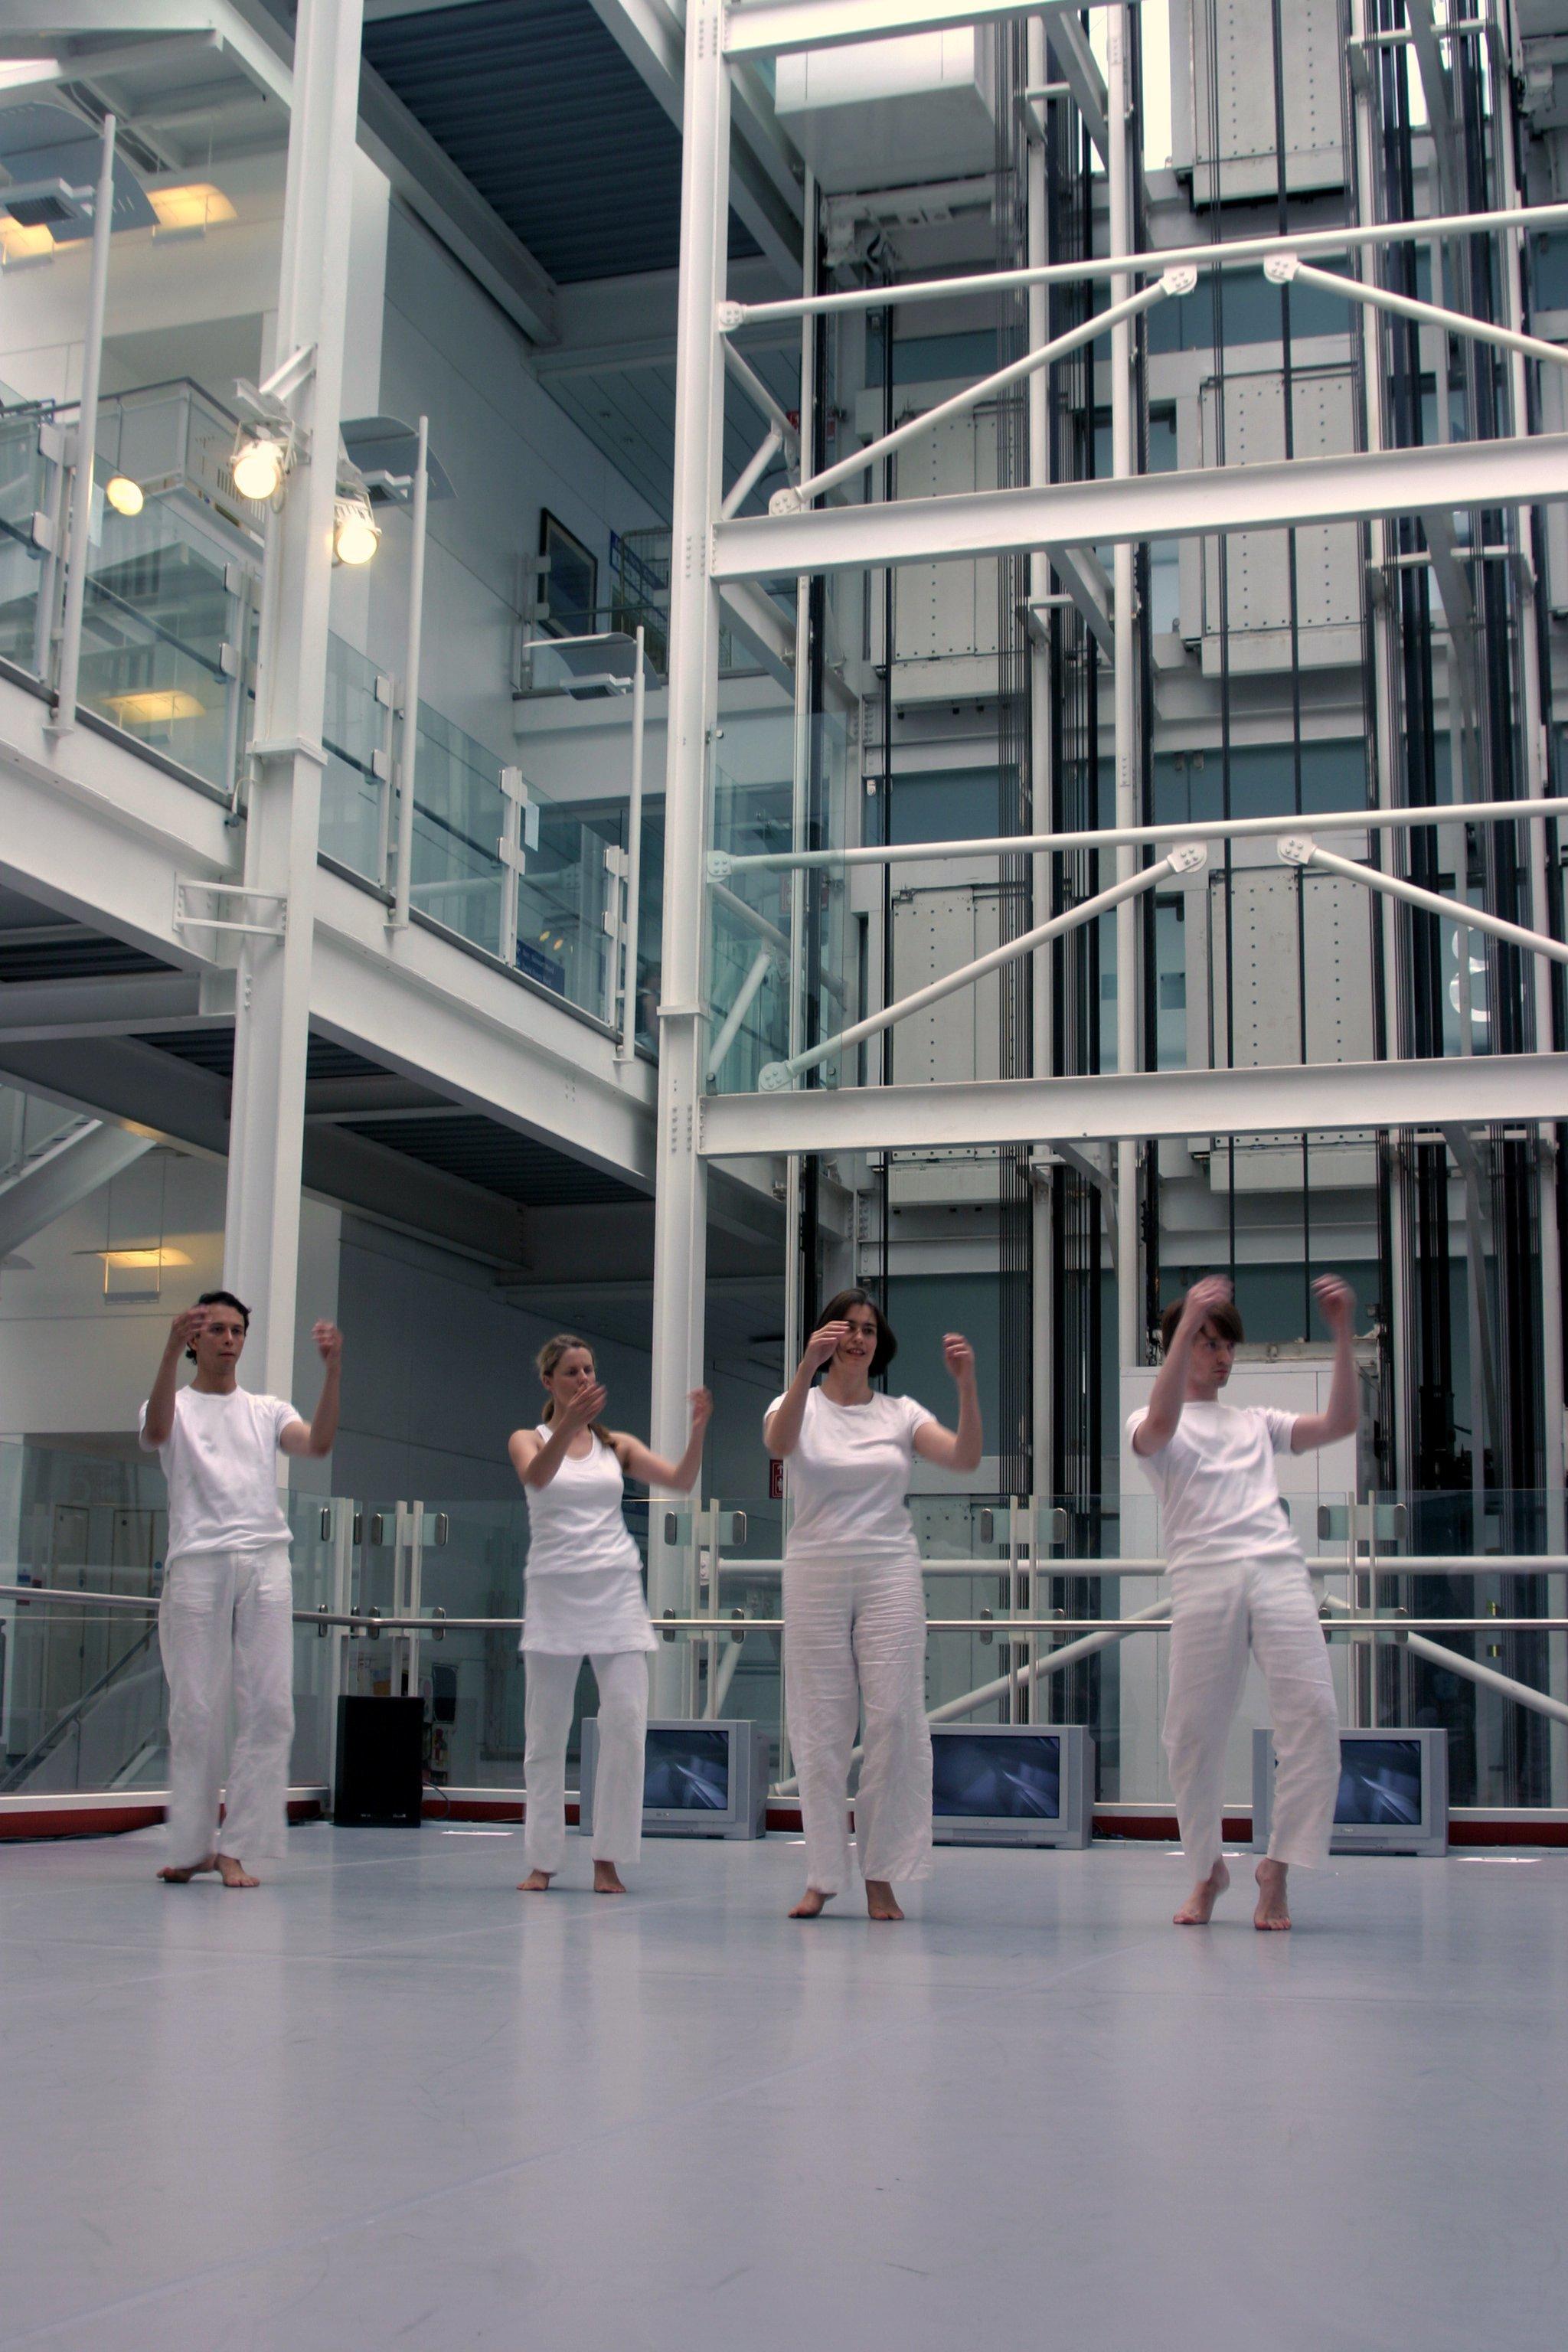 Chelsea & Westminster Hospital